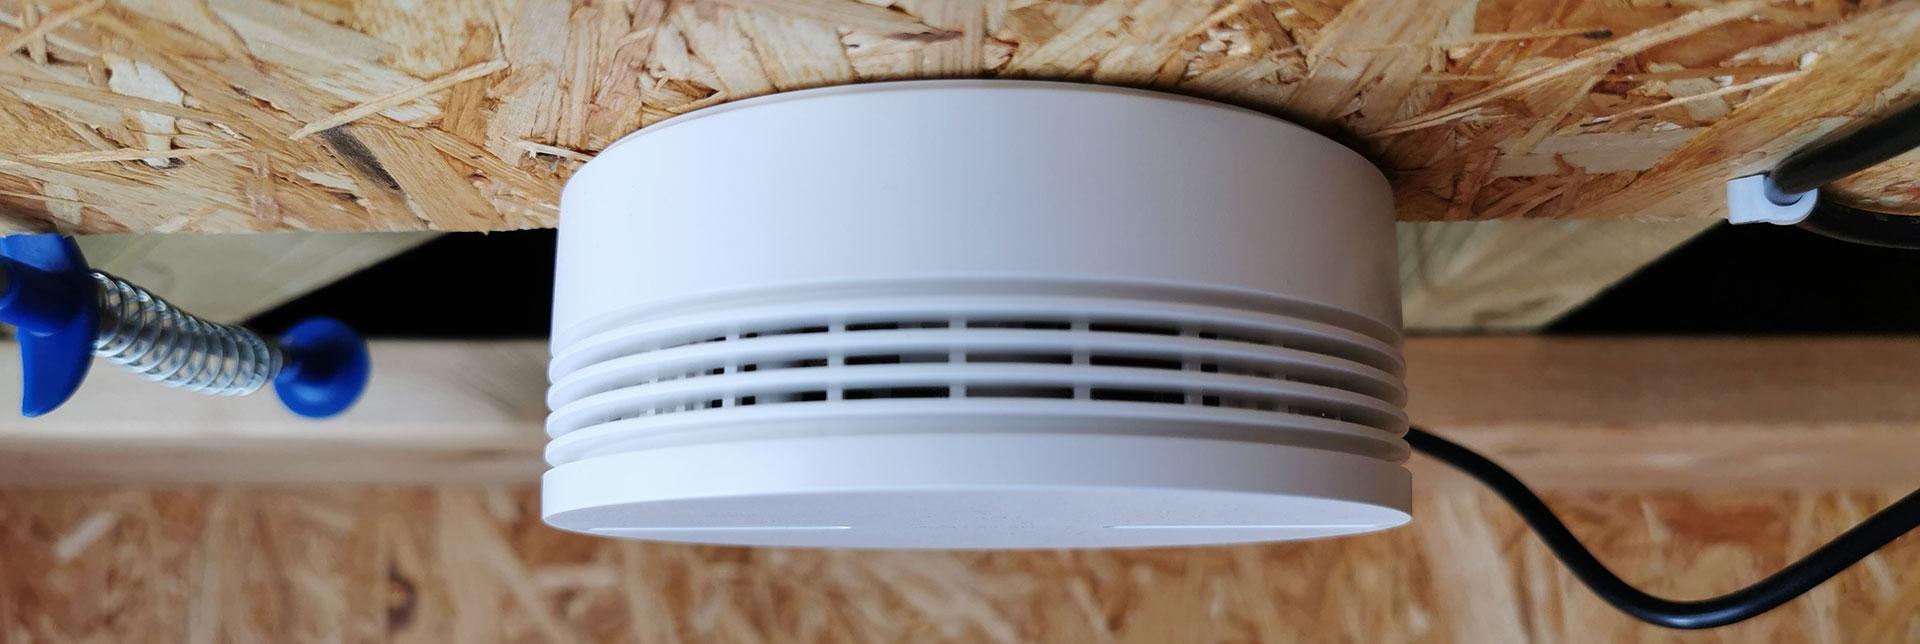 Netatmo Smart Smoke Alarm  Plafond Montage